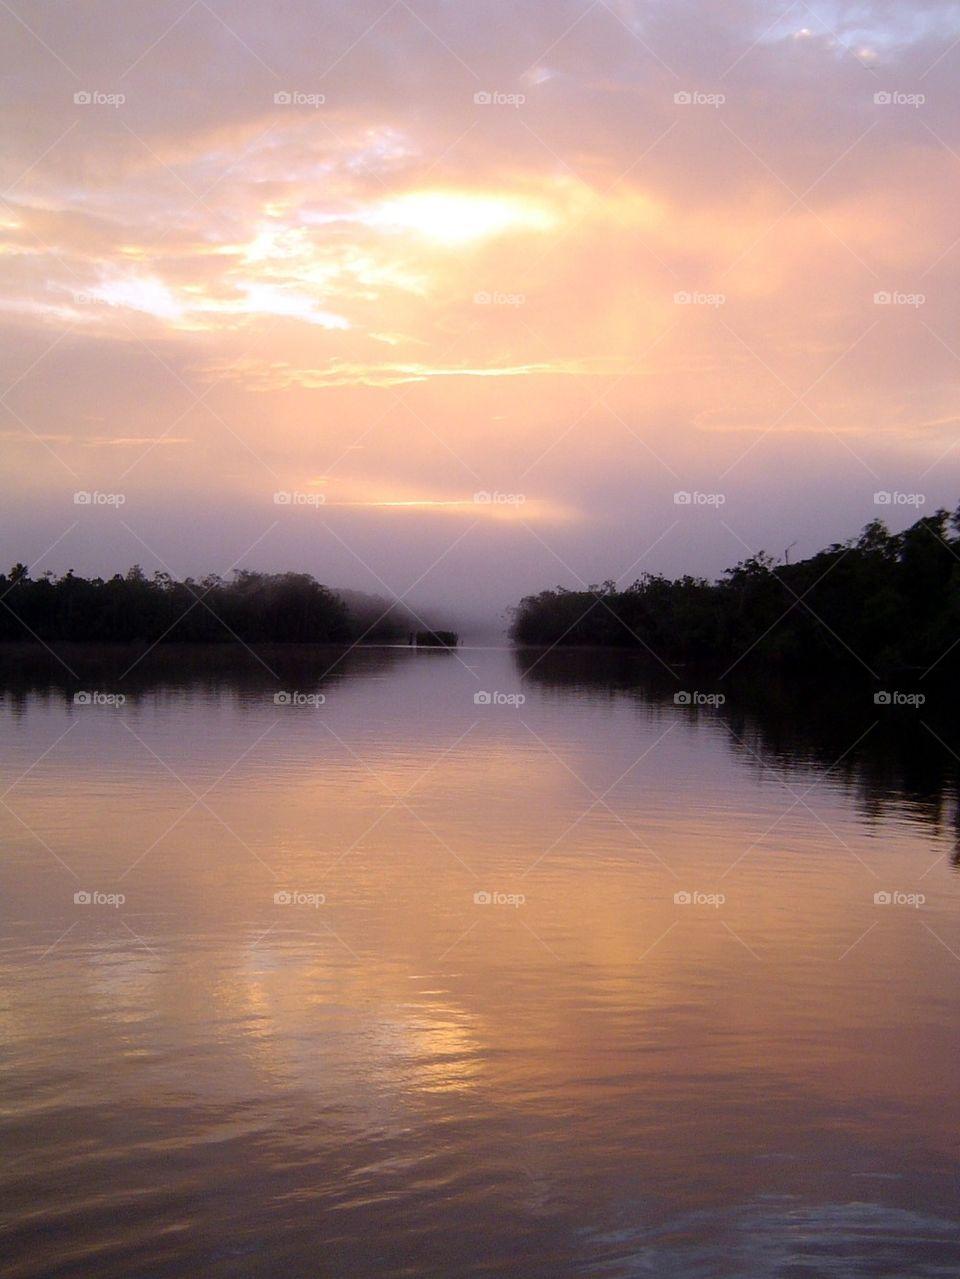 Tree reflecting on lake